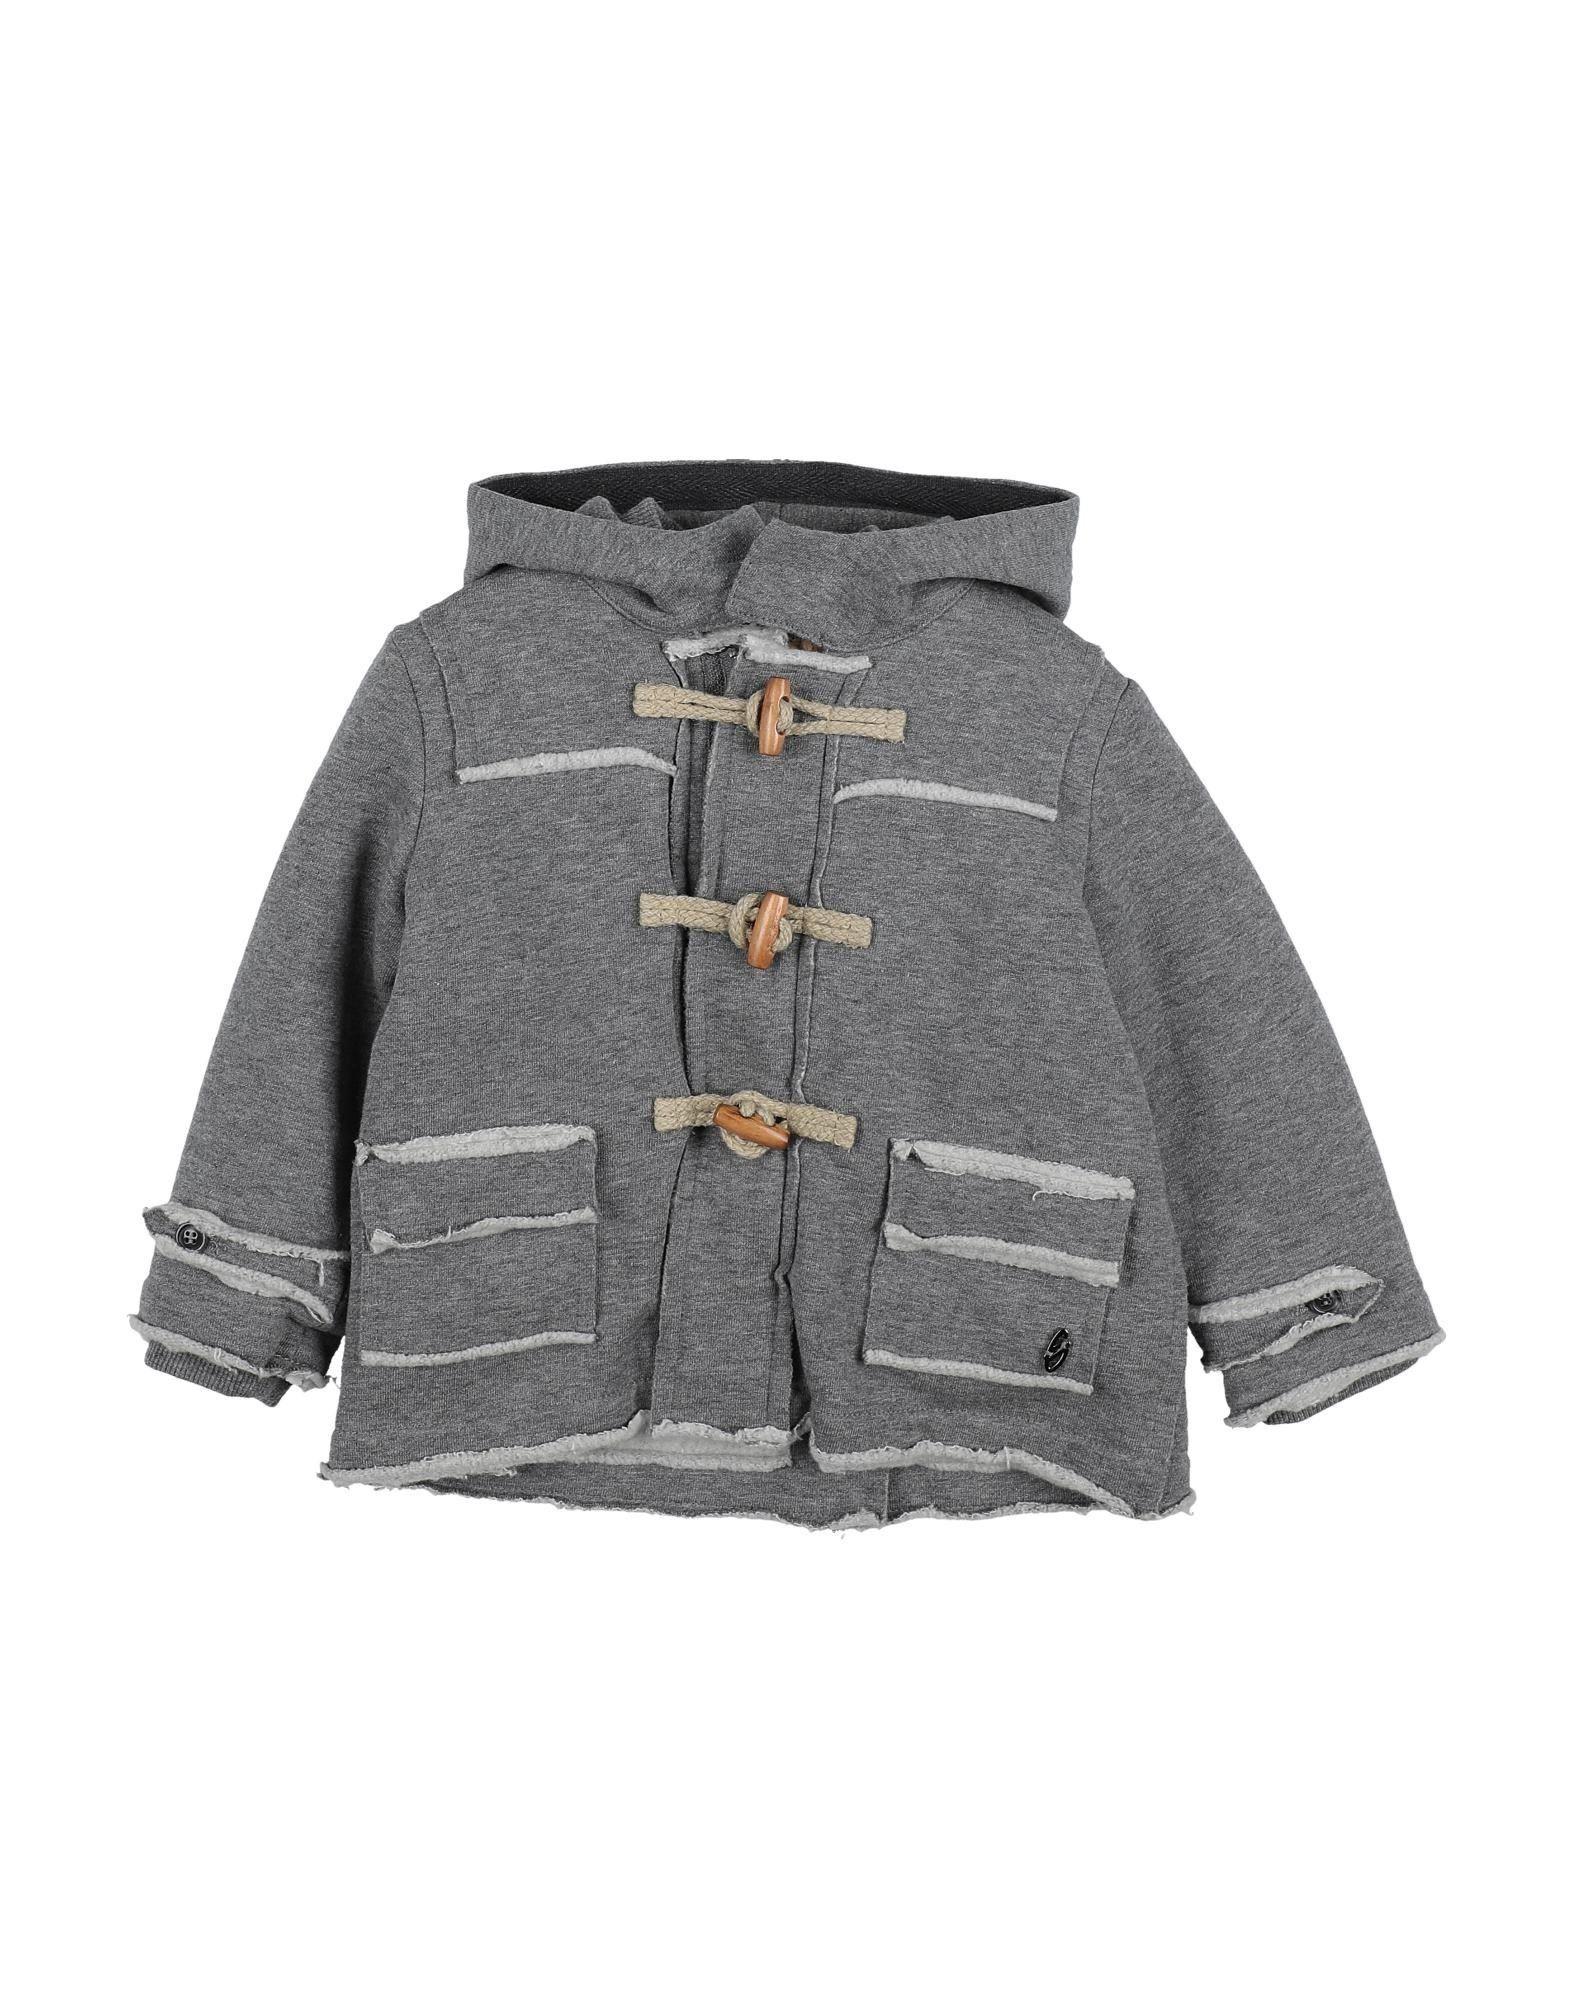 grant garçon жилет GRANT GARÇON BABY Куртка